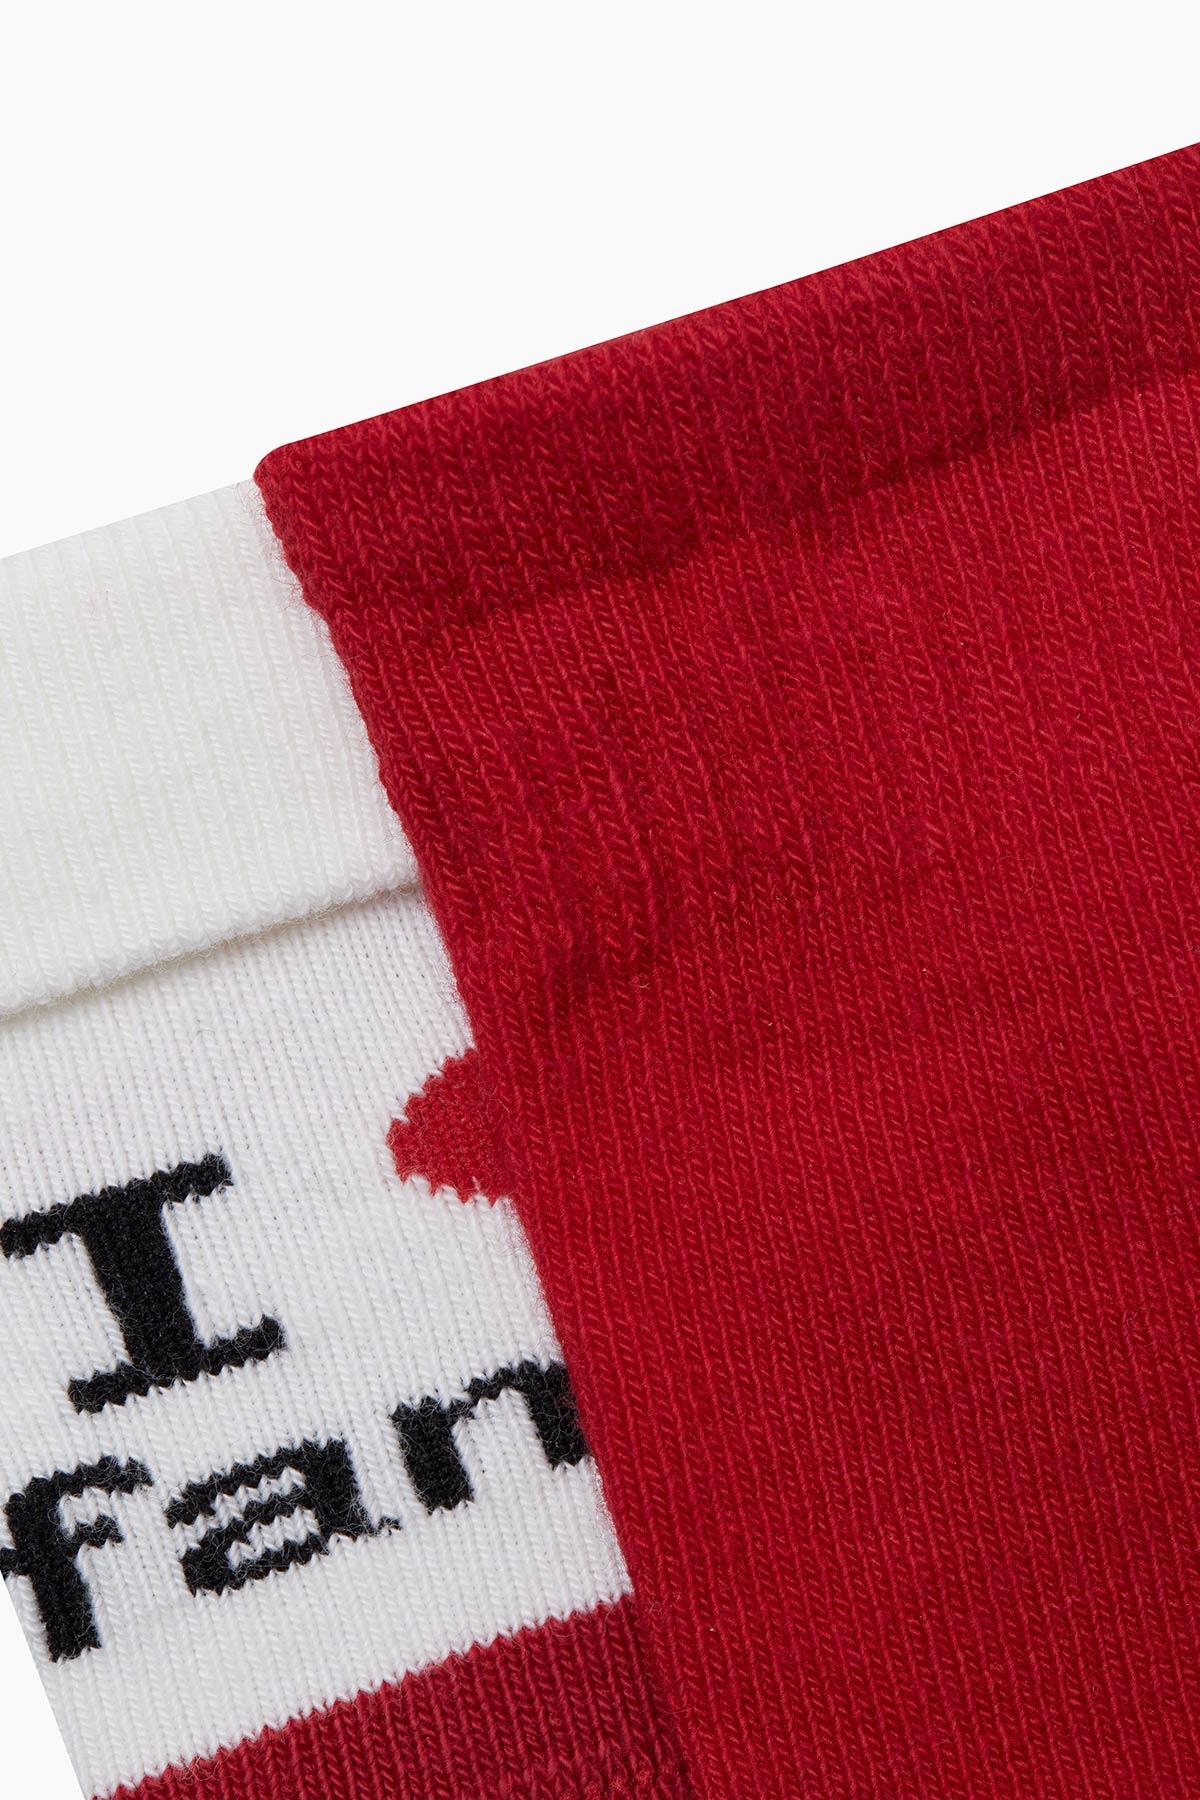 Bross 2'li Yeni Doğan Eldiven ve Çorap Kombini - Thumbnail